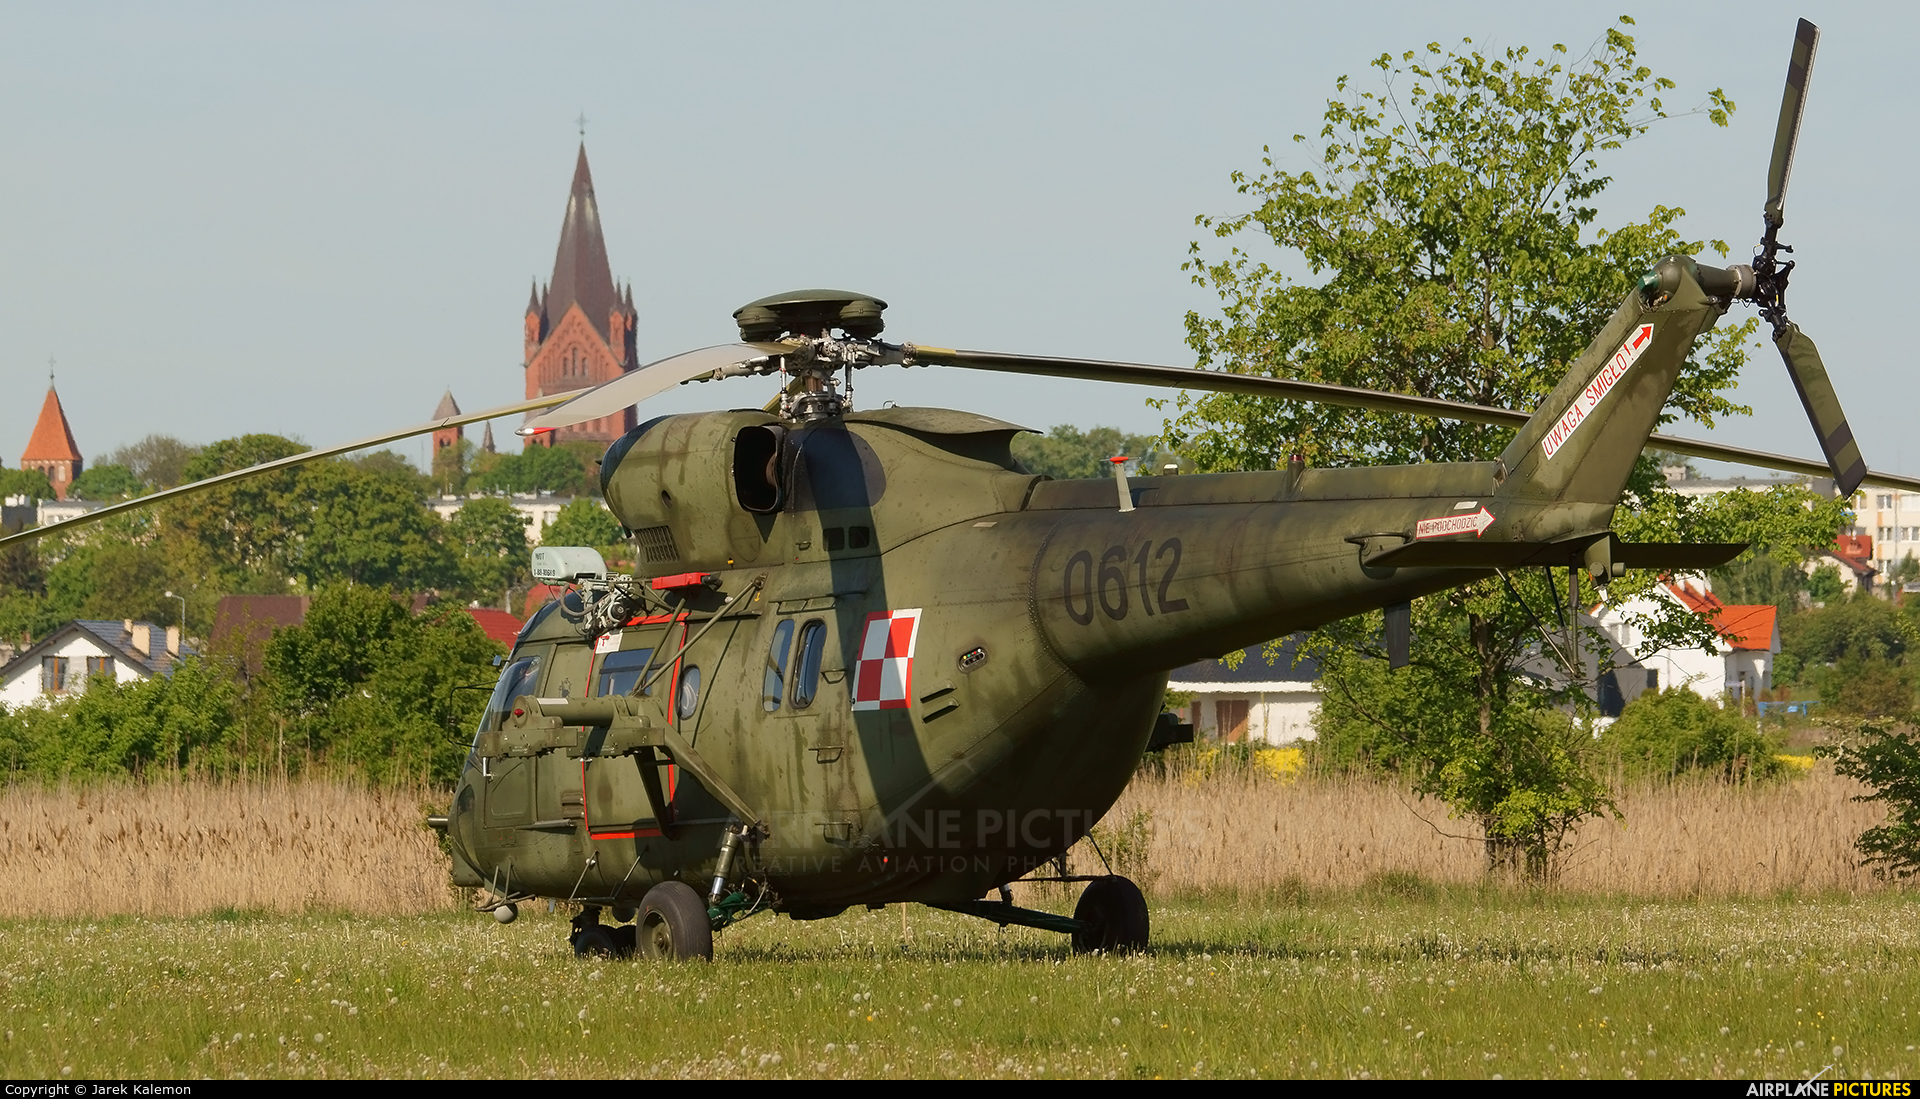 Poland - Army 0612 aircraft at Inowrocław